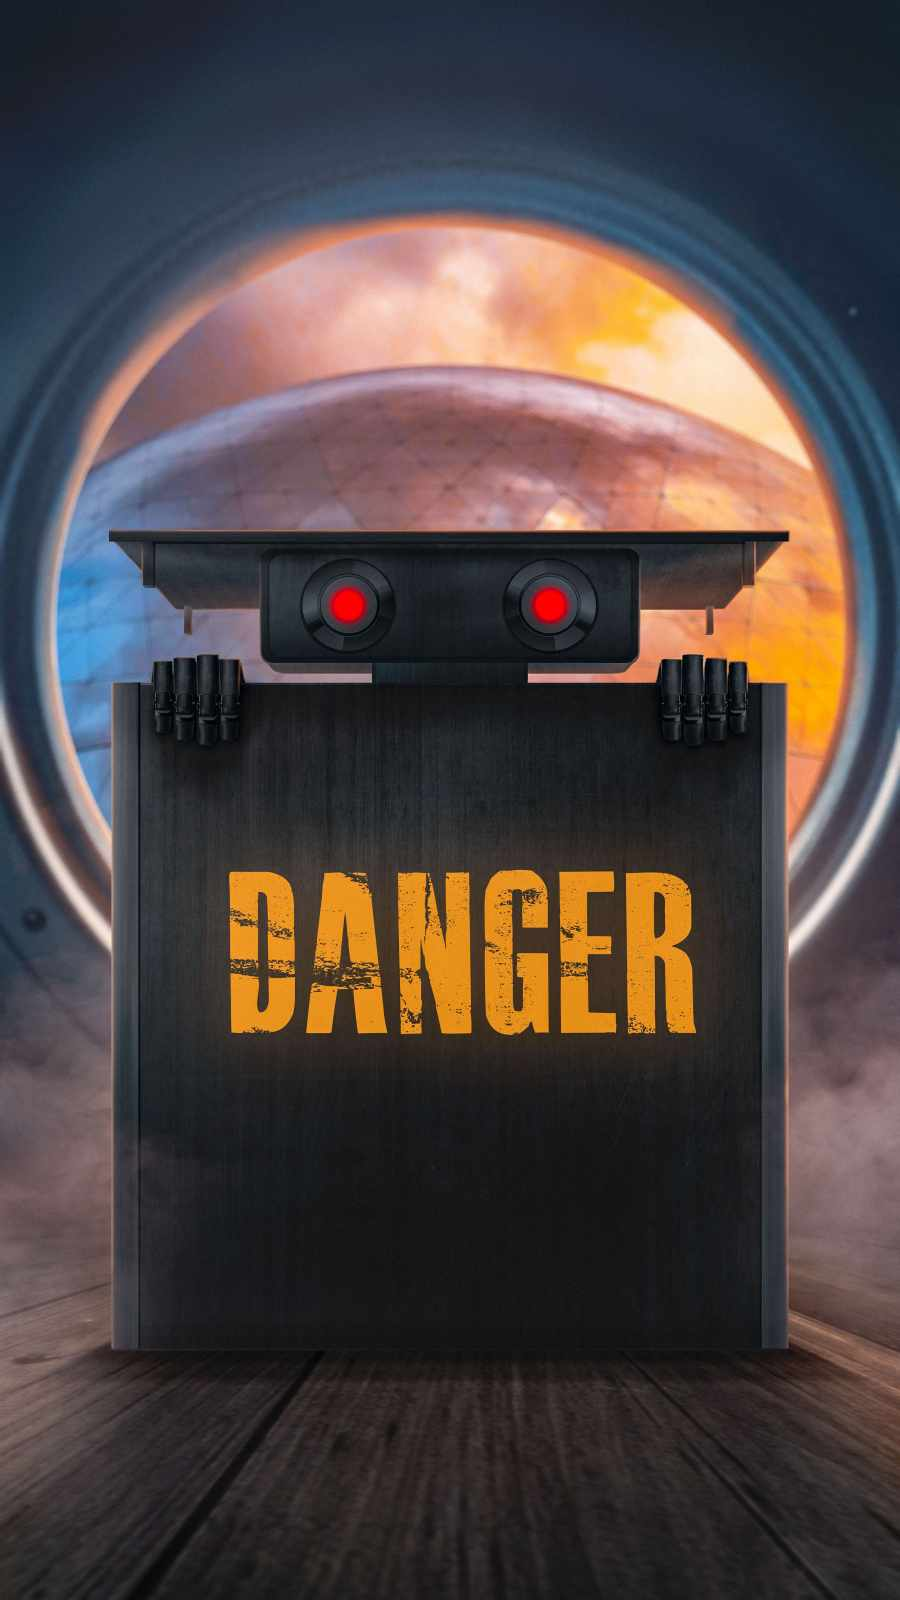 Danger Robot iPhone Wallpaper